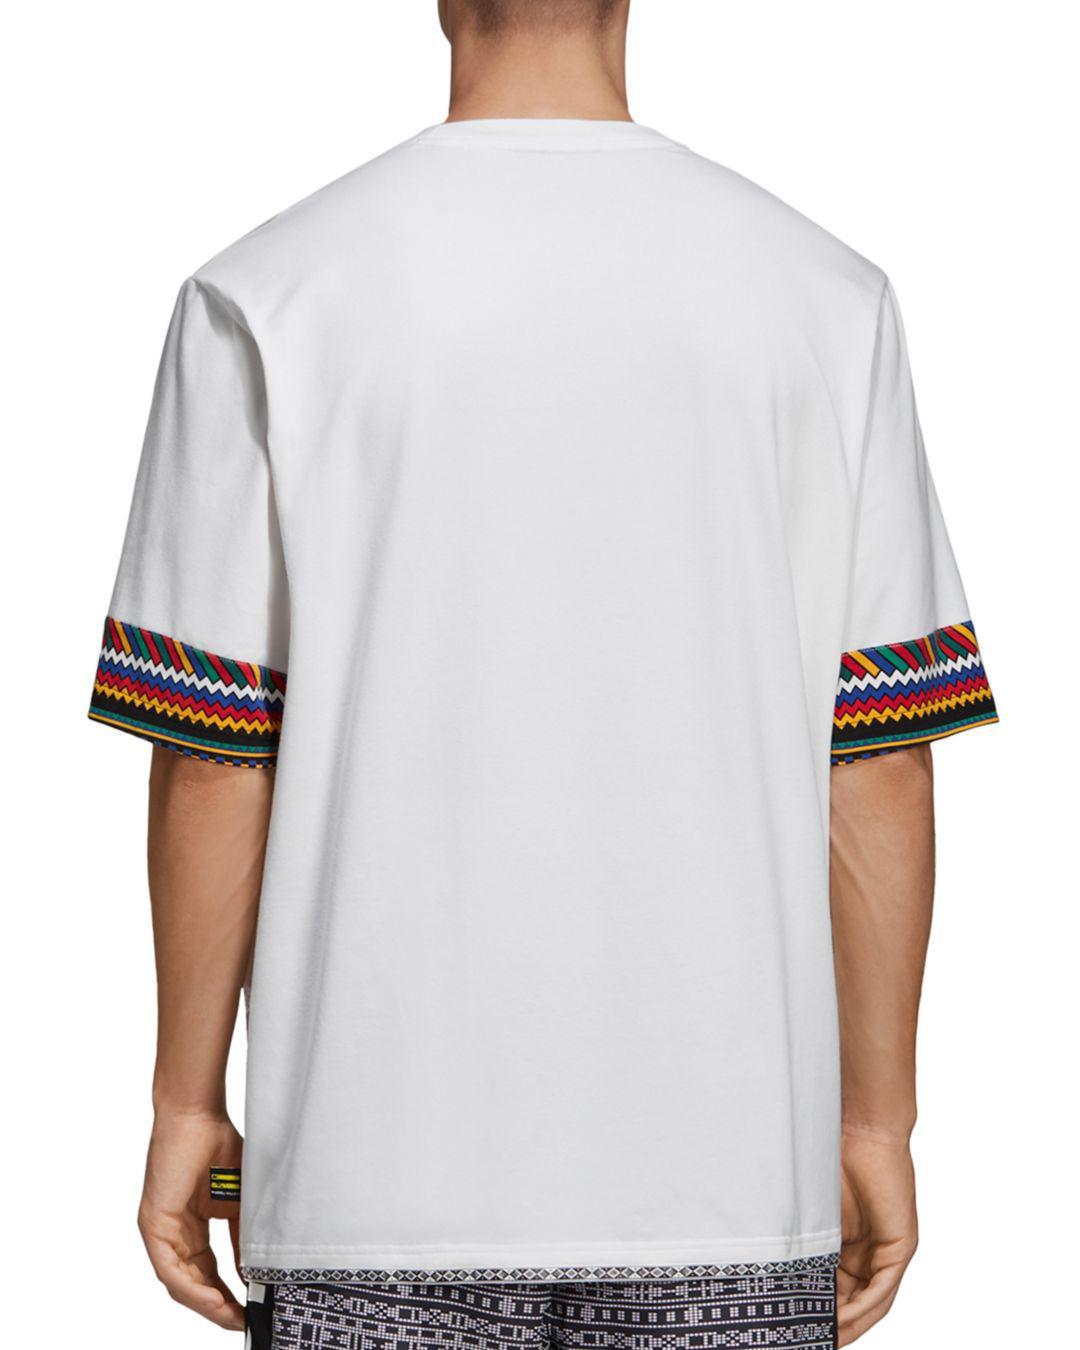 8edeb0f325884 Lyst - adidas Originals X Pharrell Williams Solar Hu Trefoil Tee in White  for Men